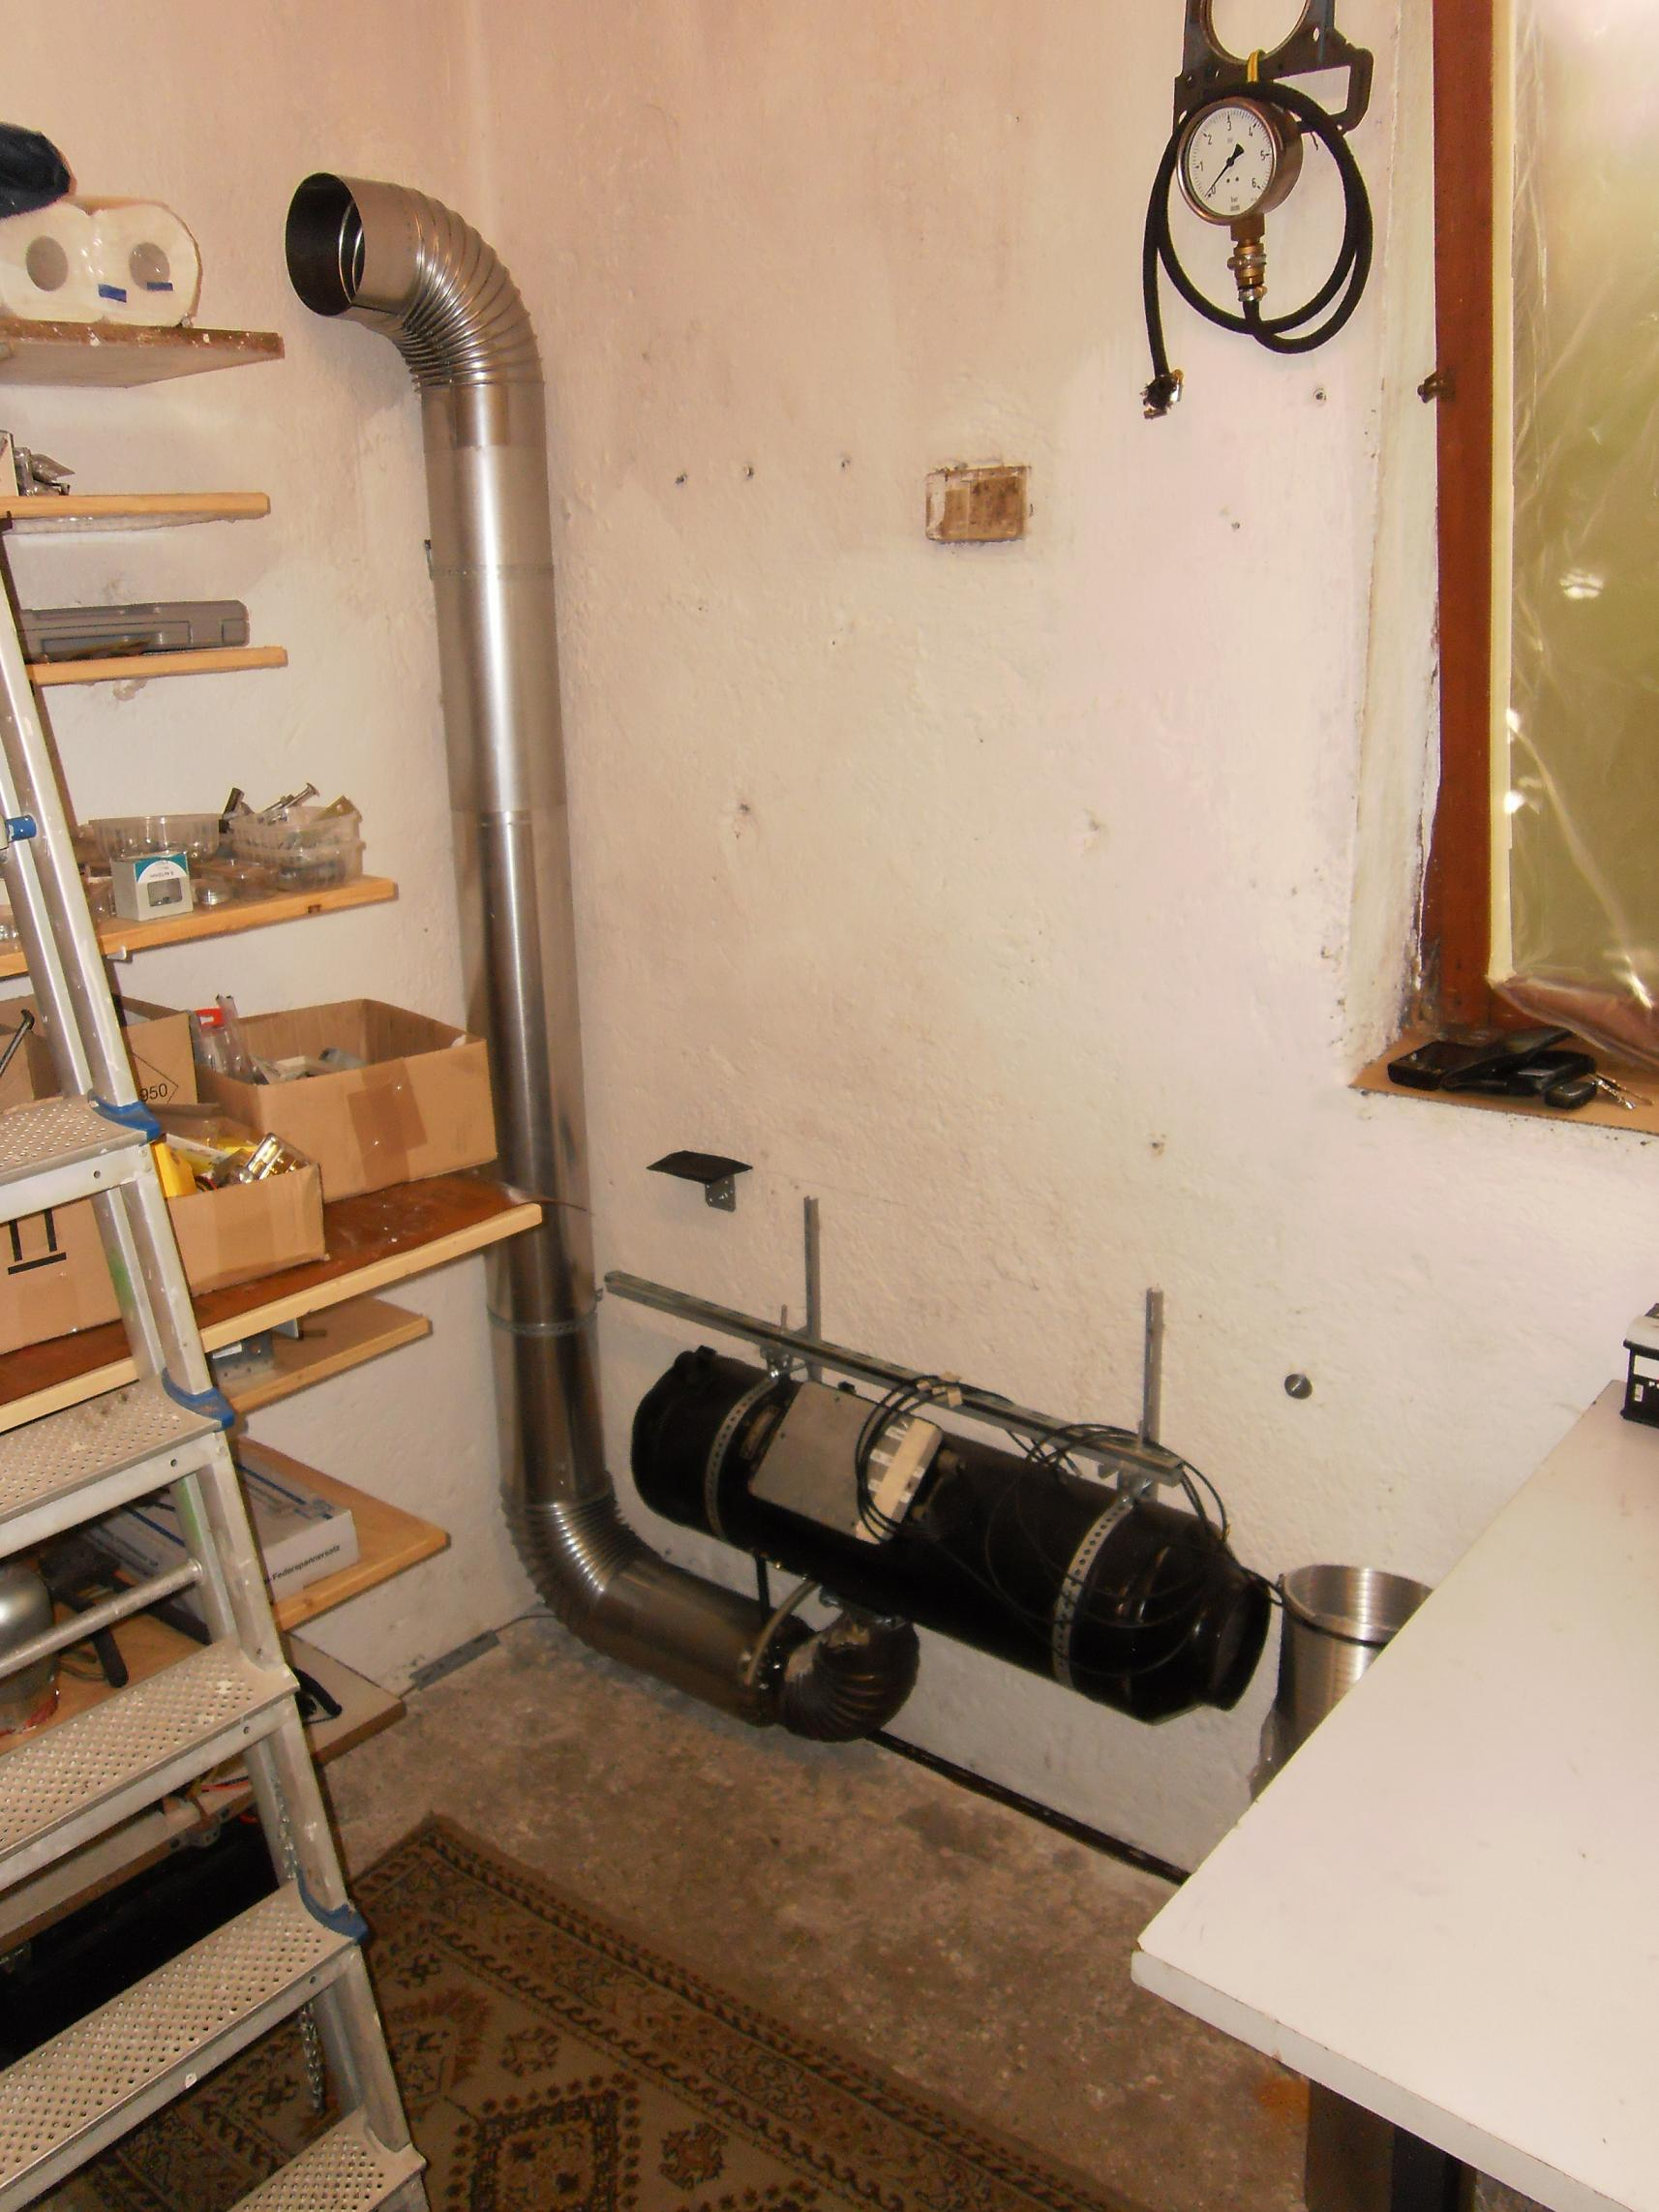 manta garage finsing es ist kalt macht doch nichts. Black Bedroom Furniture Sets. Home Design Ideas